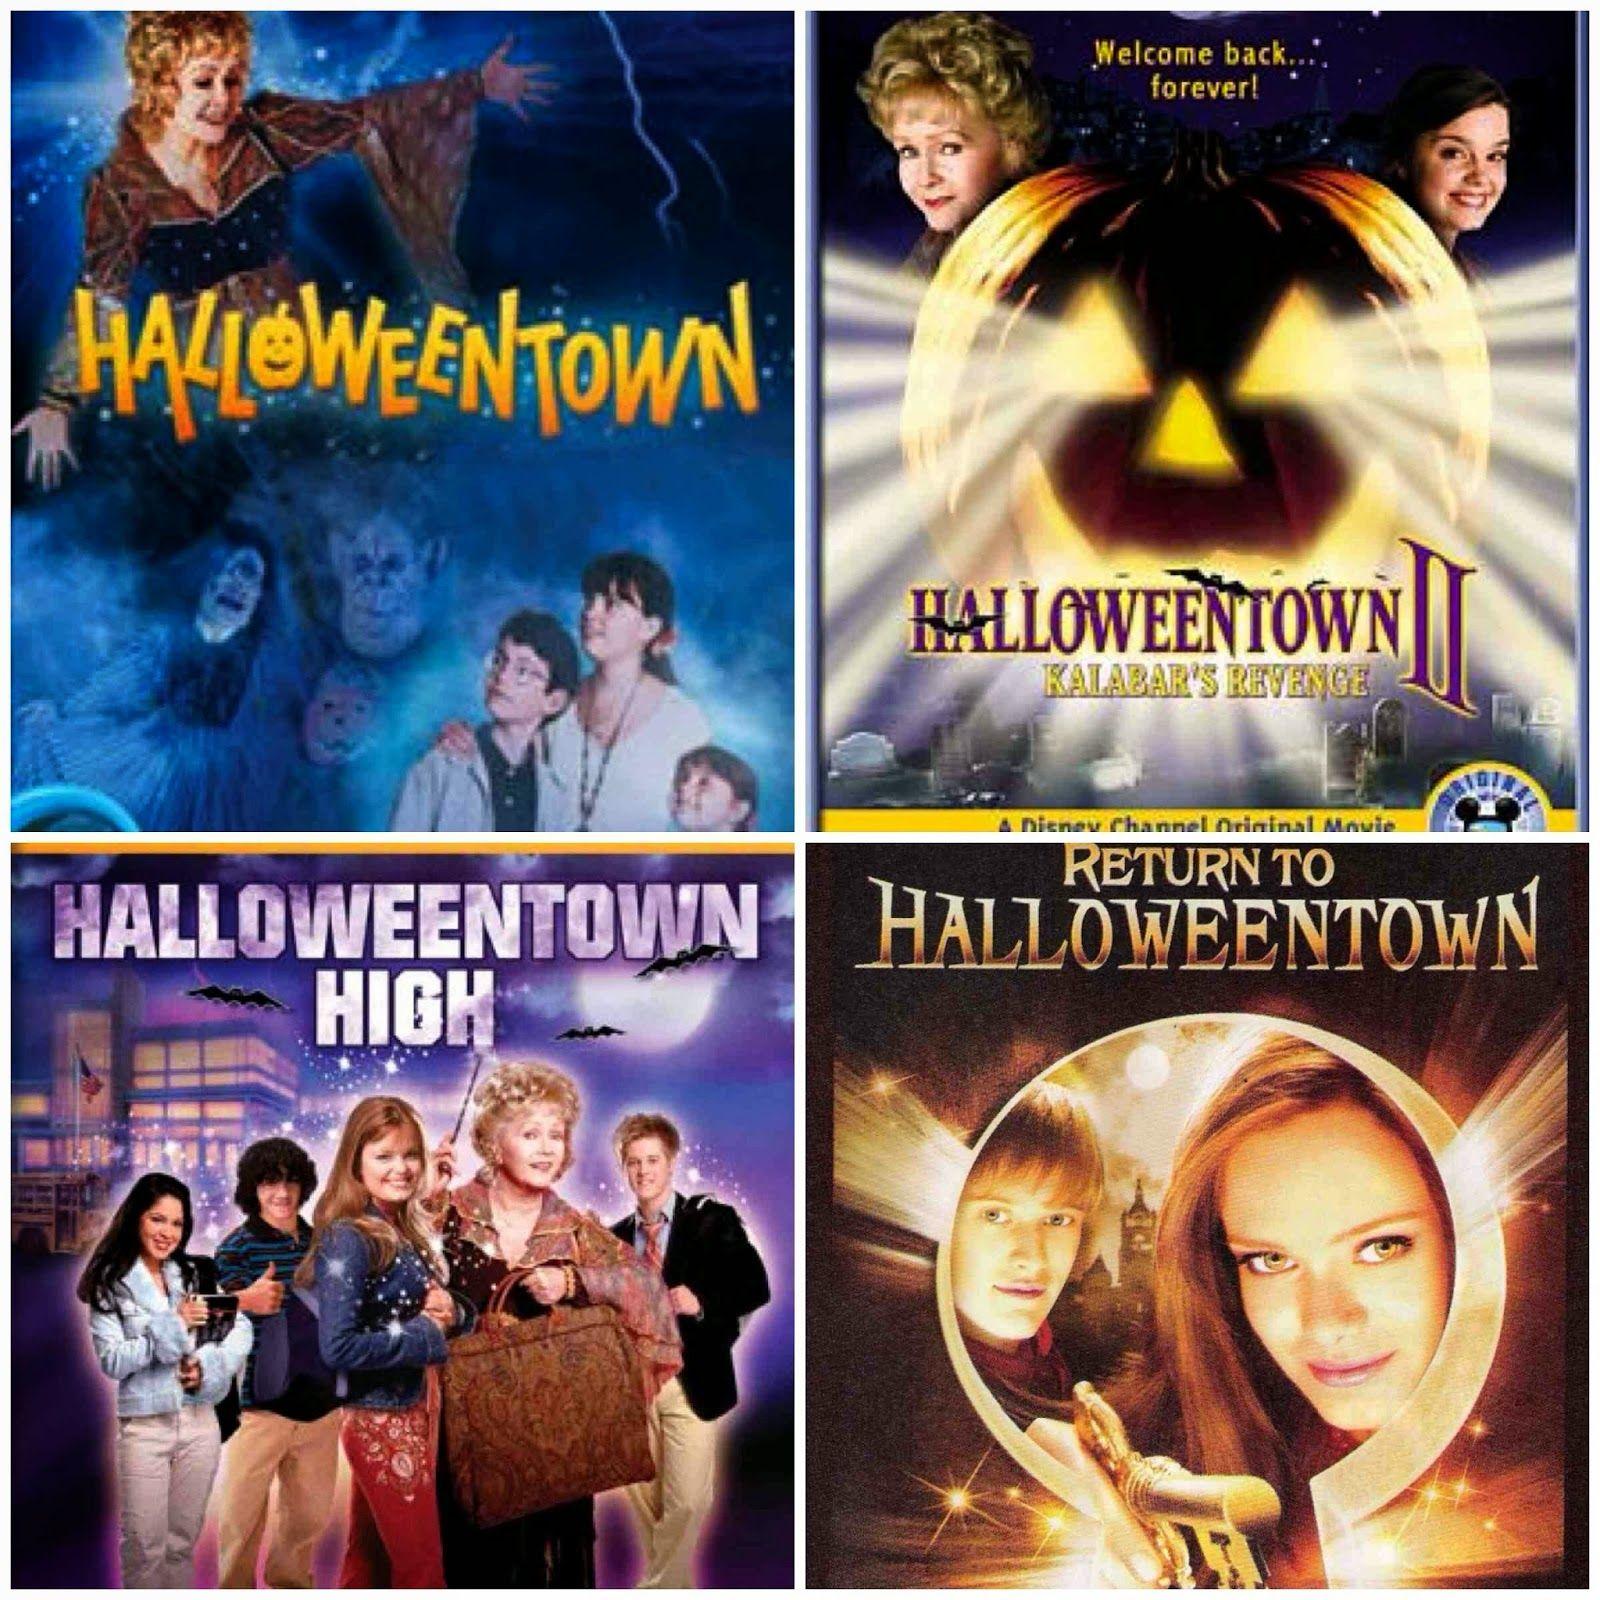 disney halloween movies 90s Google Search Disney